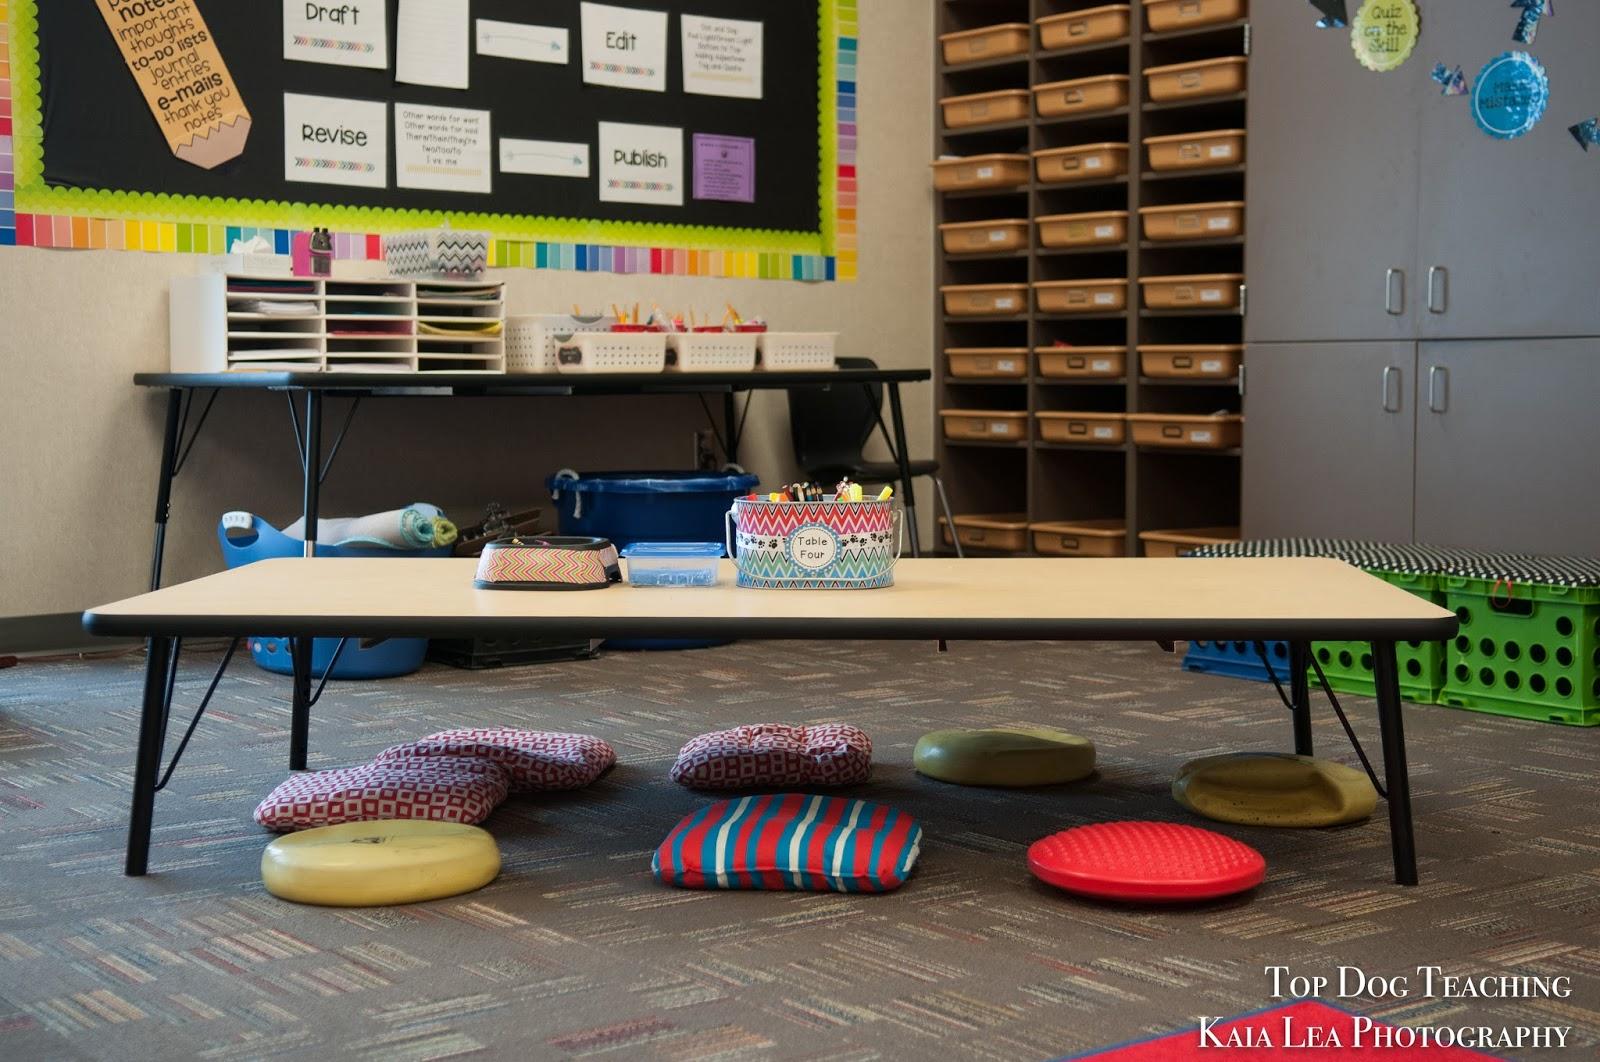 Top Dog Teaching Classroom Design Inspiration